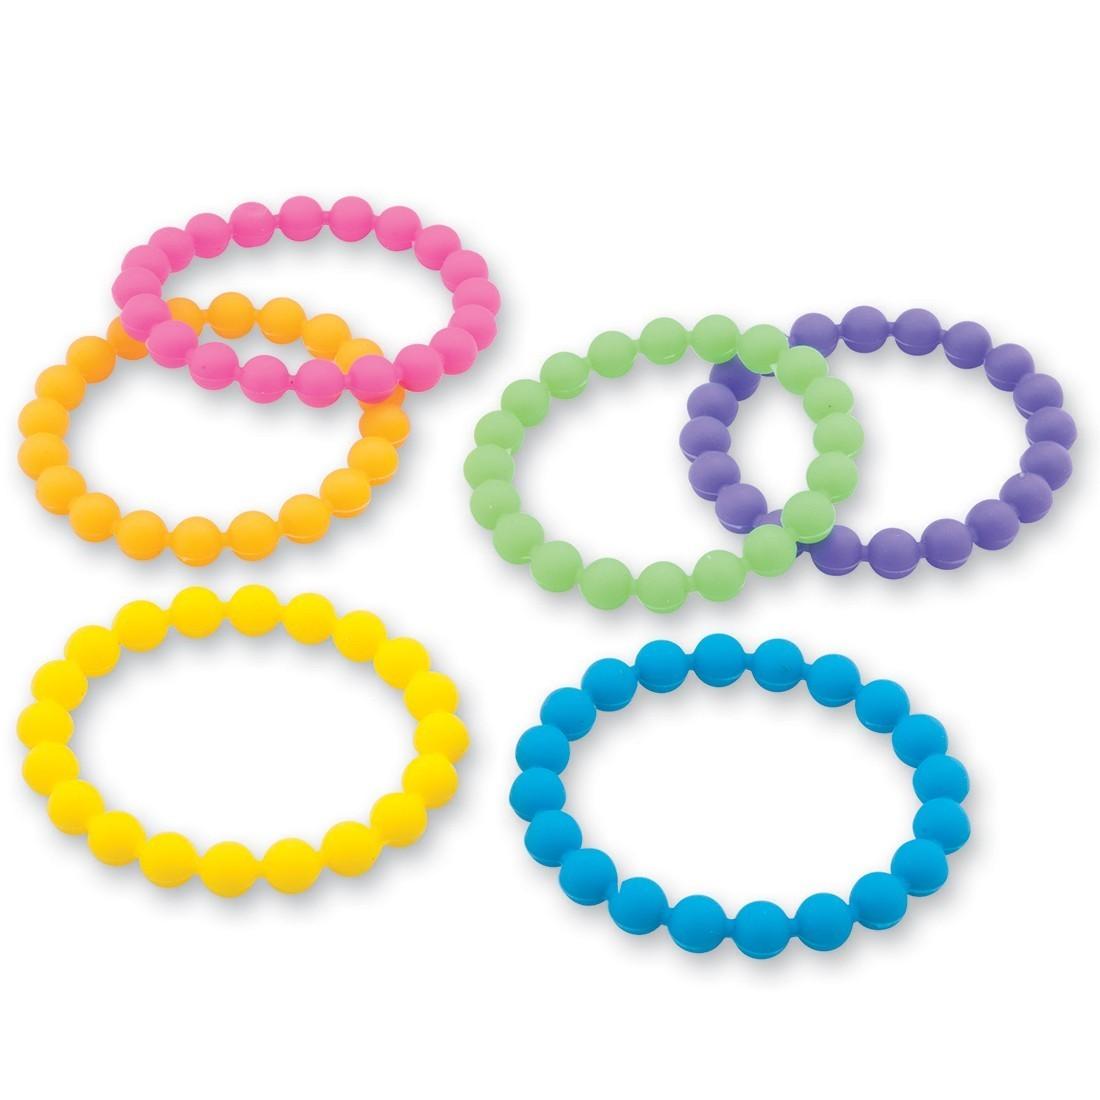 Neon Rubber Bead Bracelets [image]